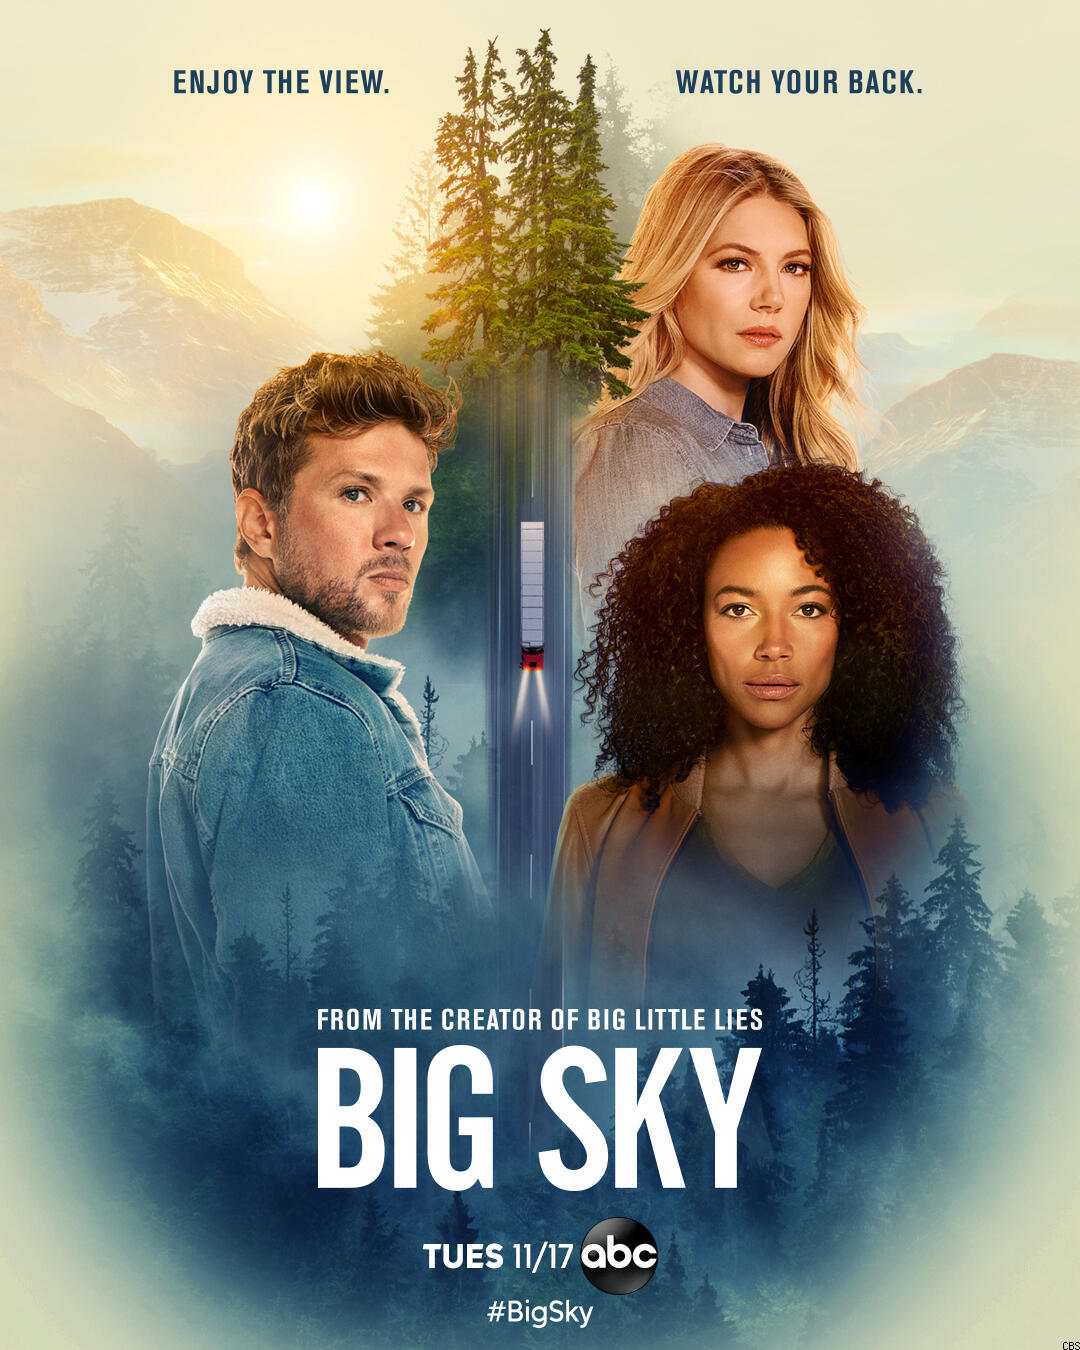 Big Sky poster.jpg